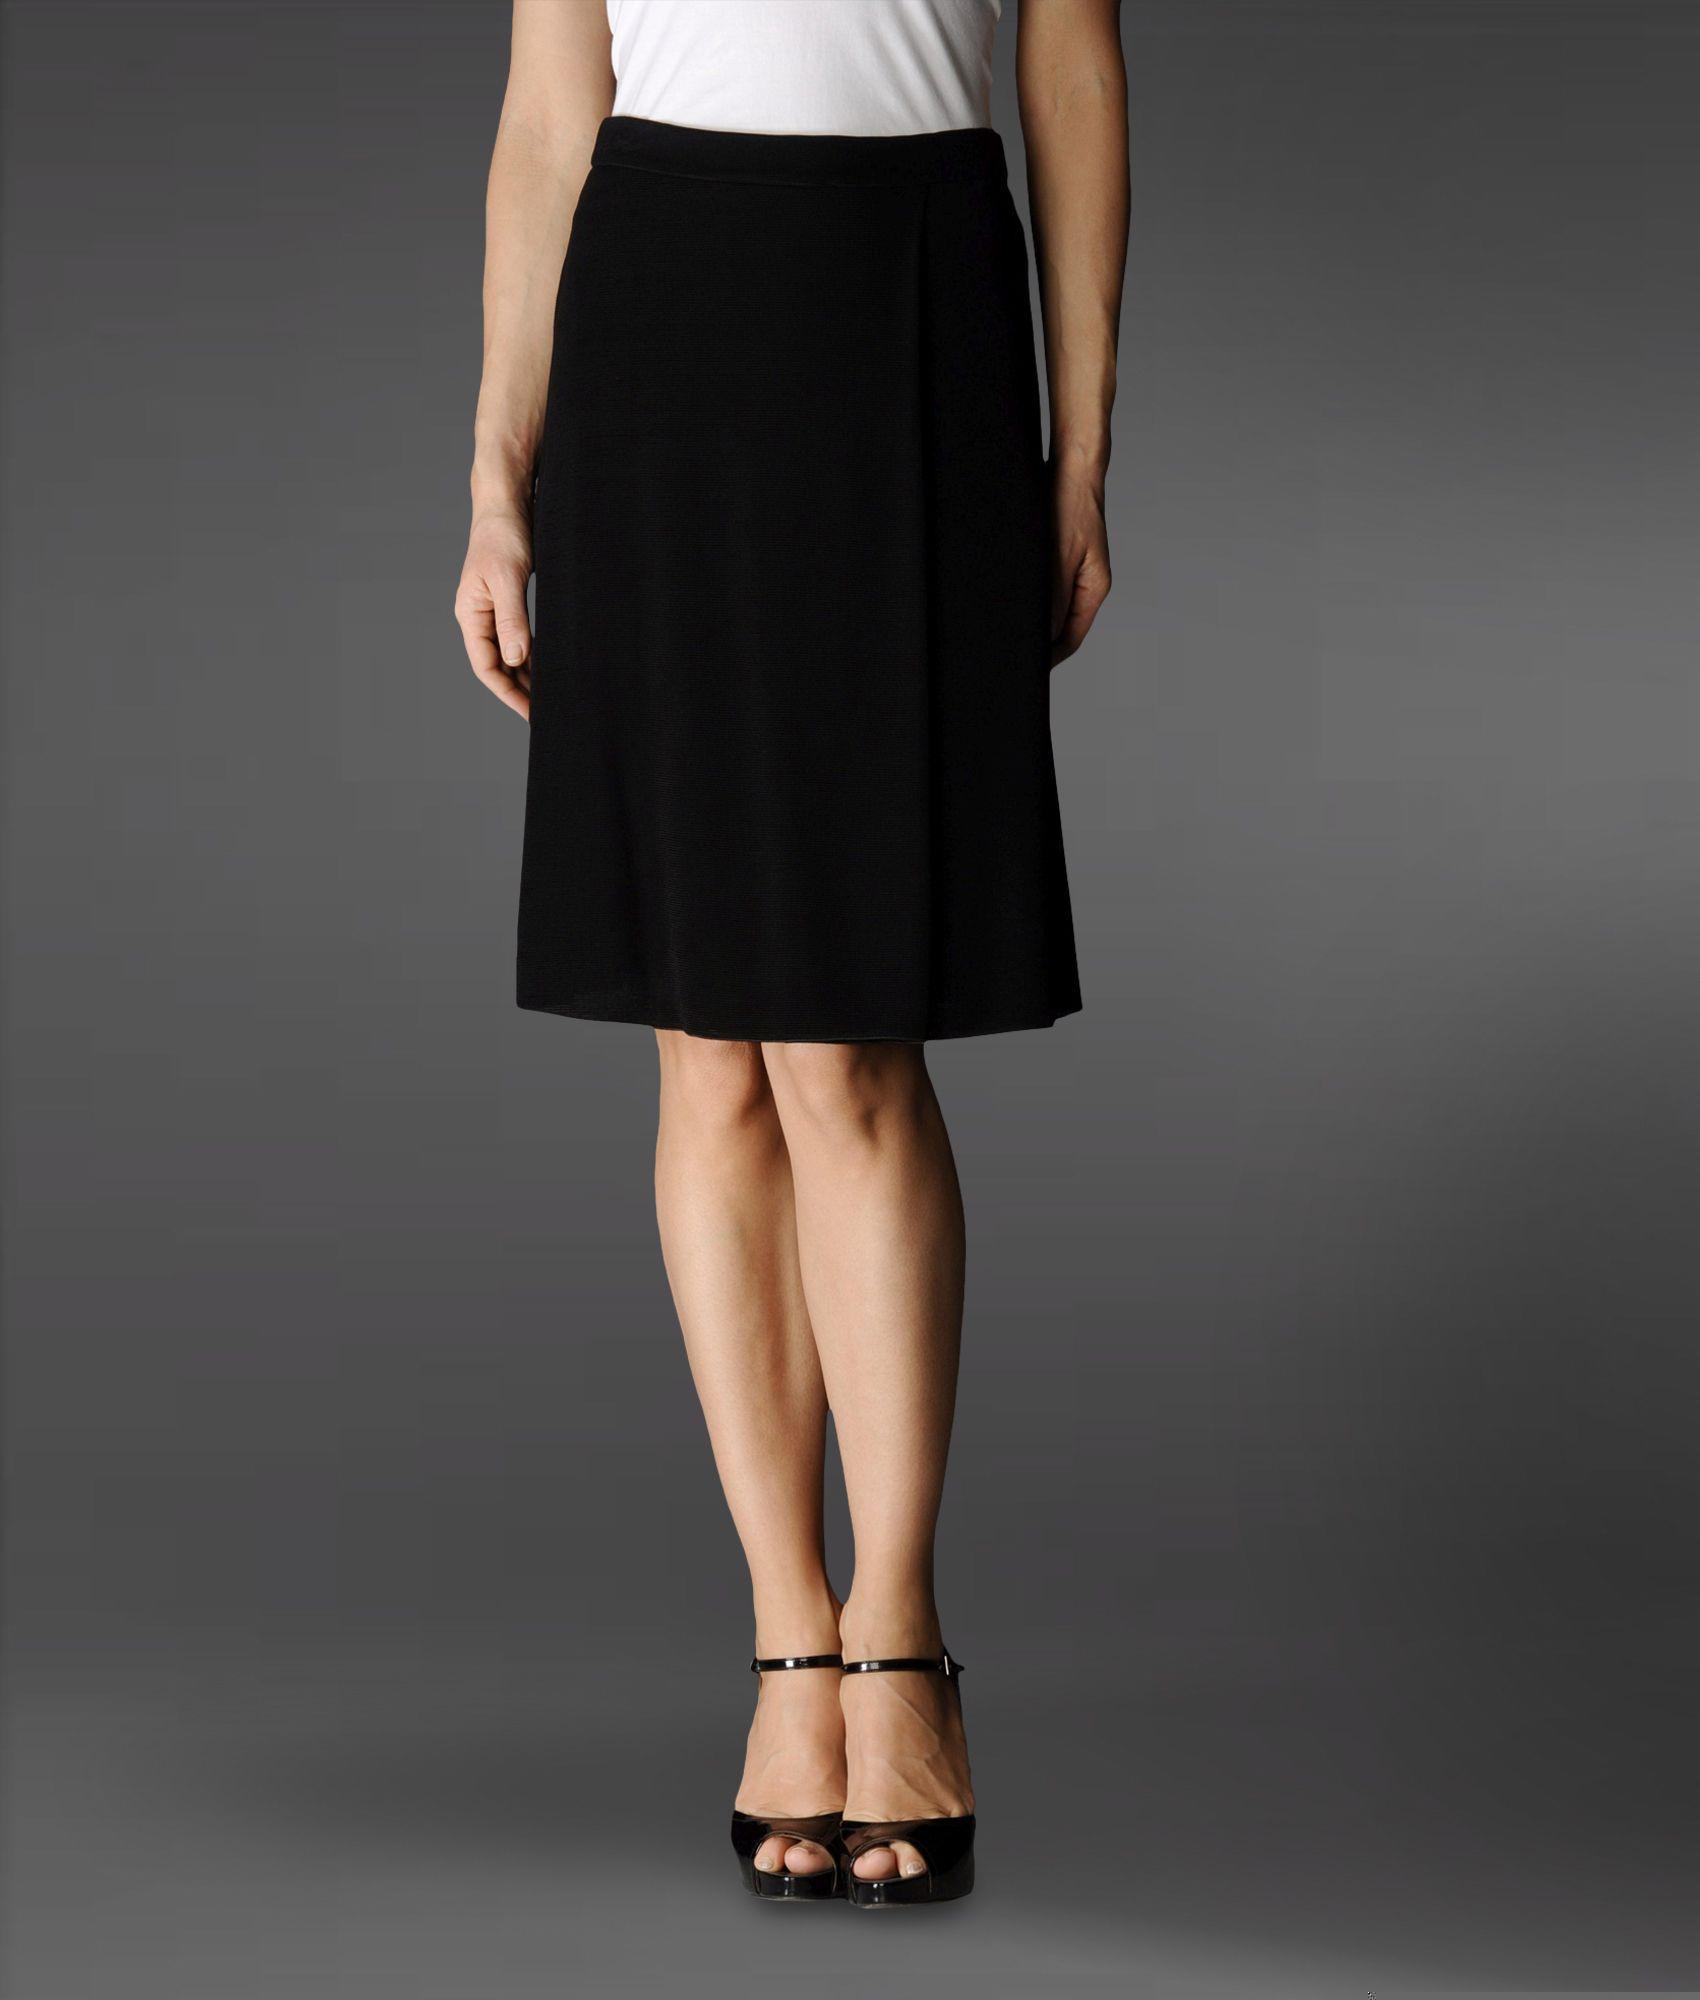 Armani Knee Length Skirt in Black | Lyst